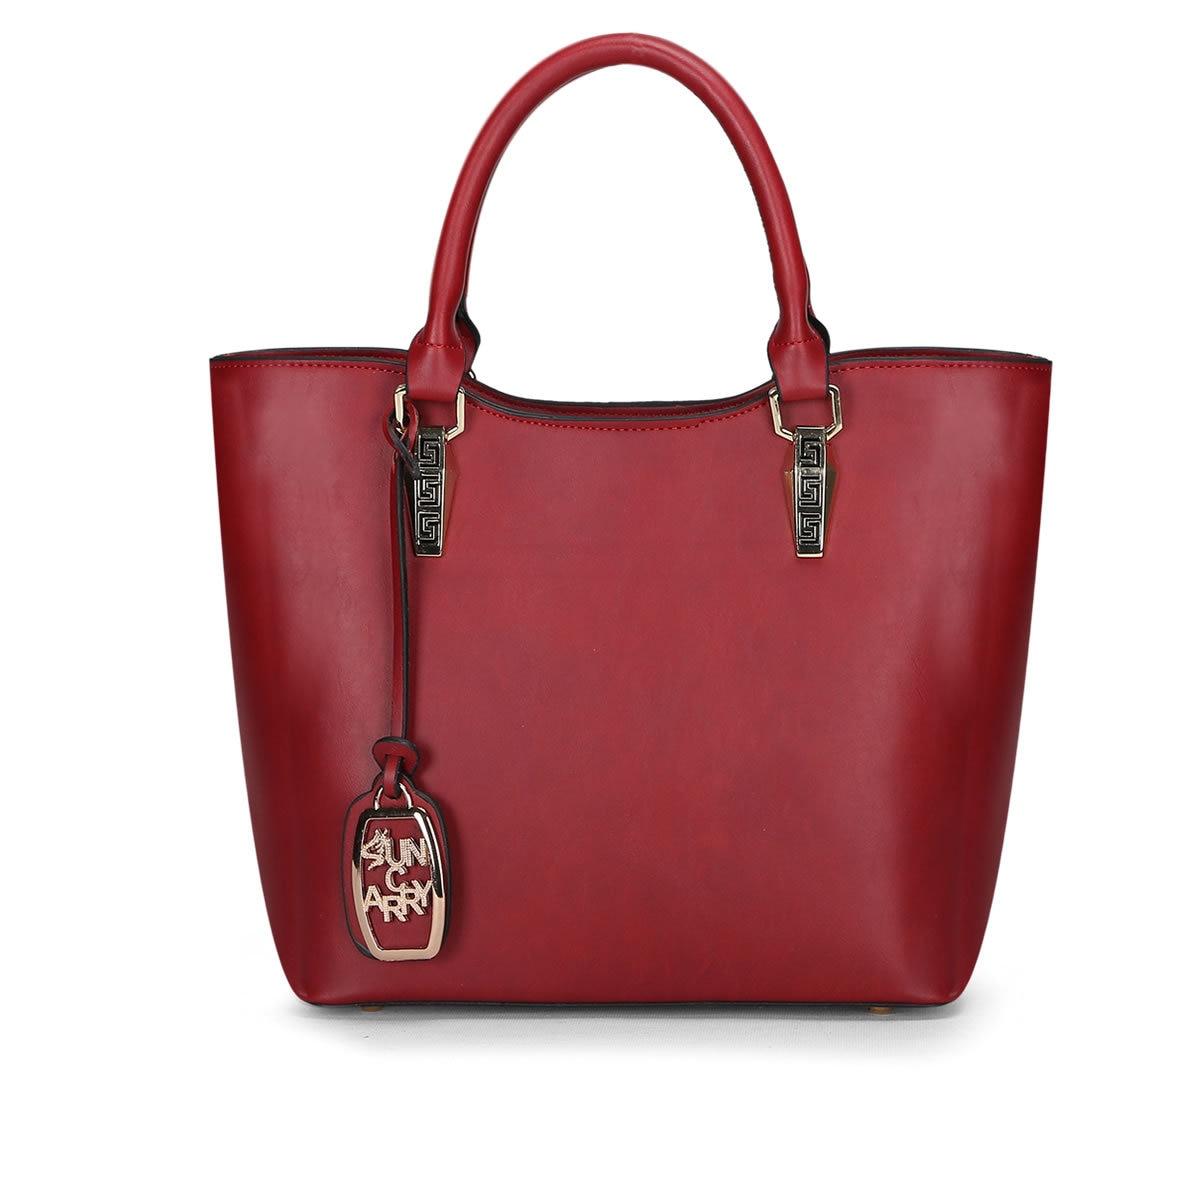 ФОТО Hot Sale 2017 Fashion Designer Brand Women Pu Leather Handbags Ladies Shoulder Bags Female Vintage Messenger Bag SMYYG-A0096